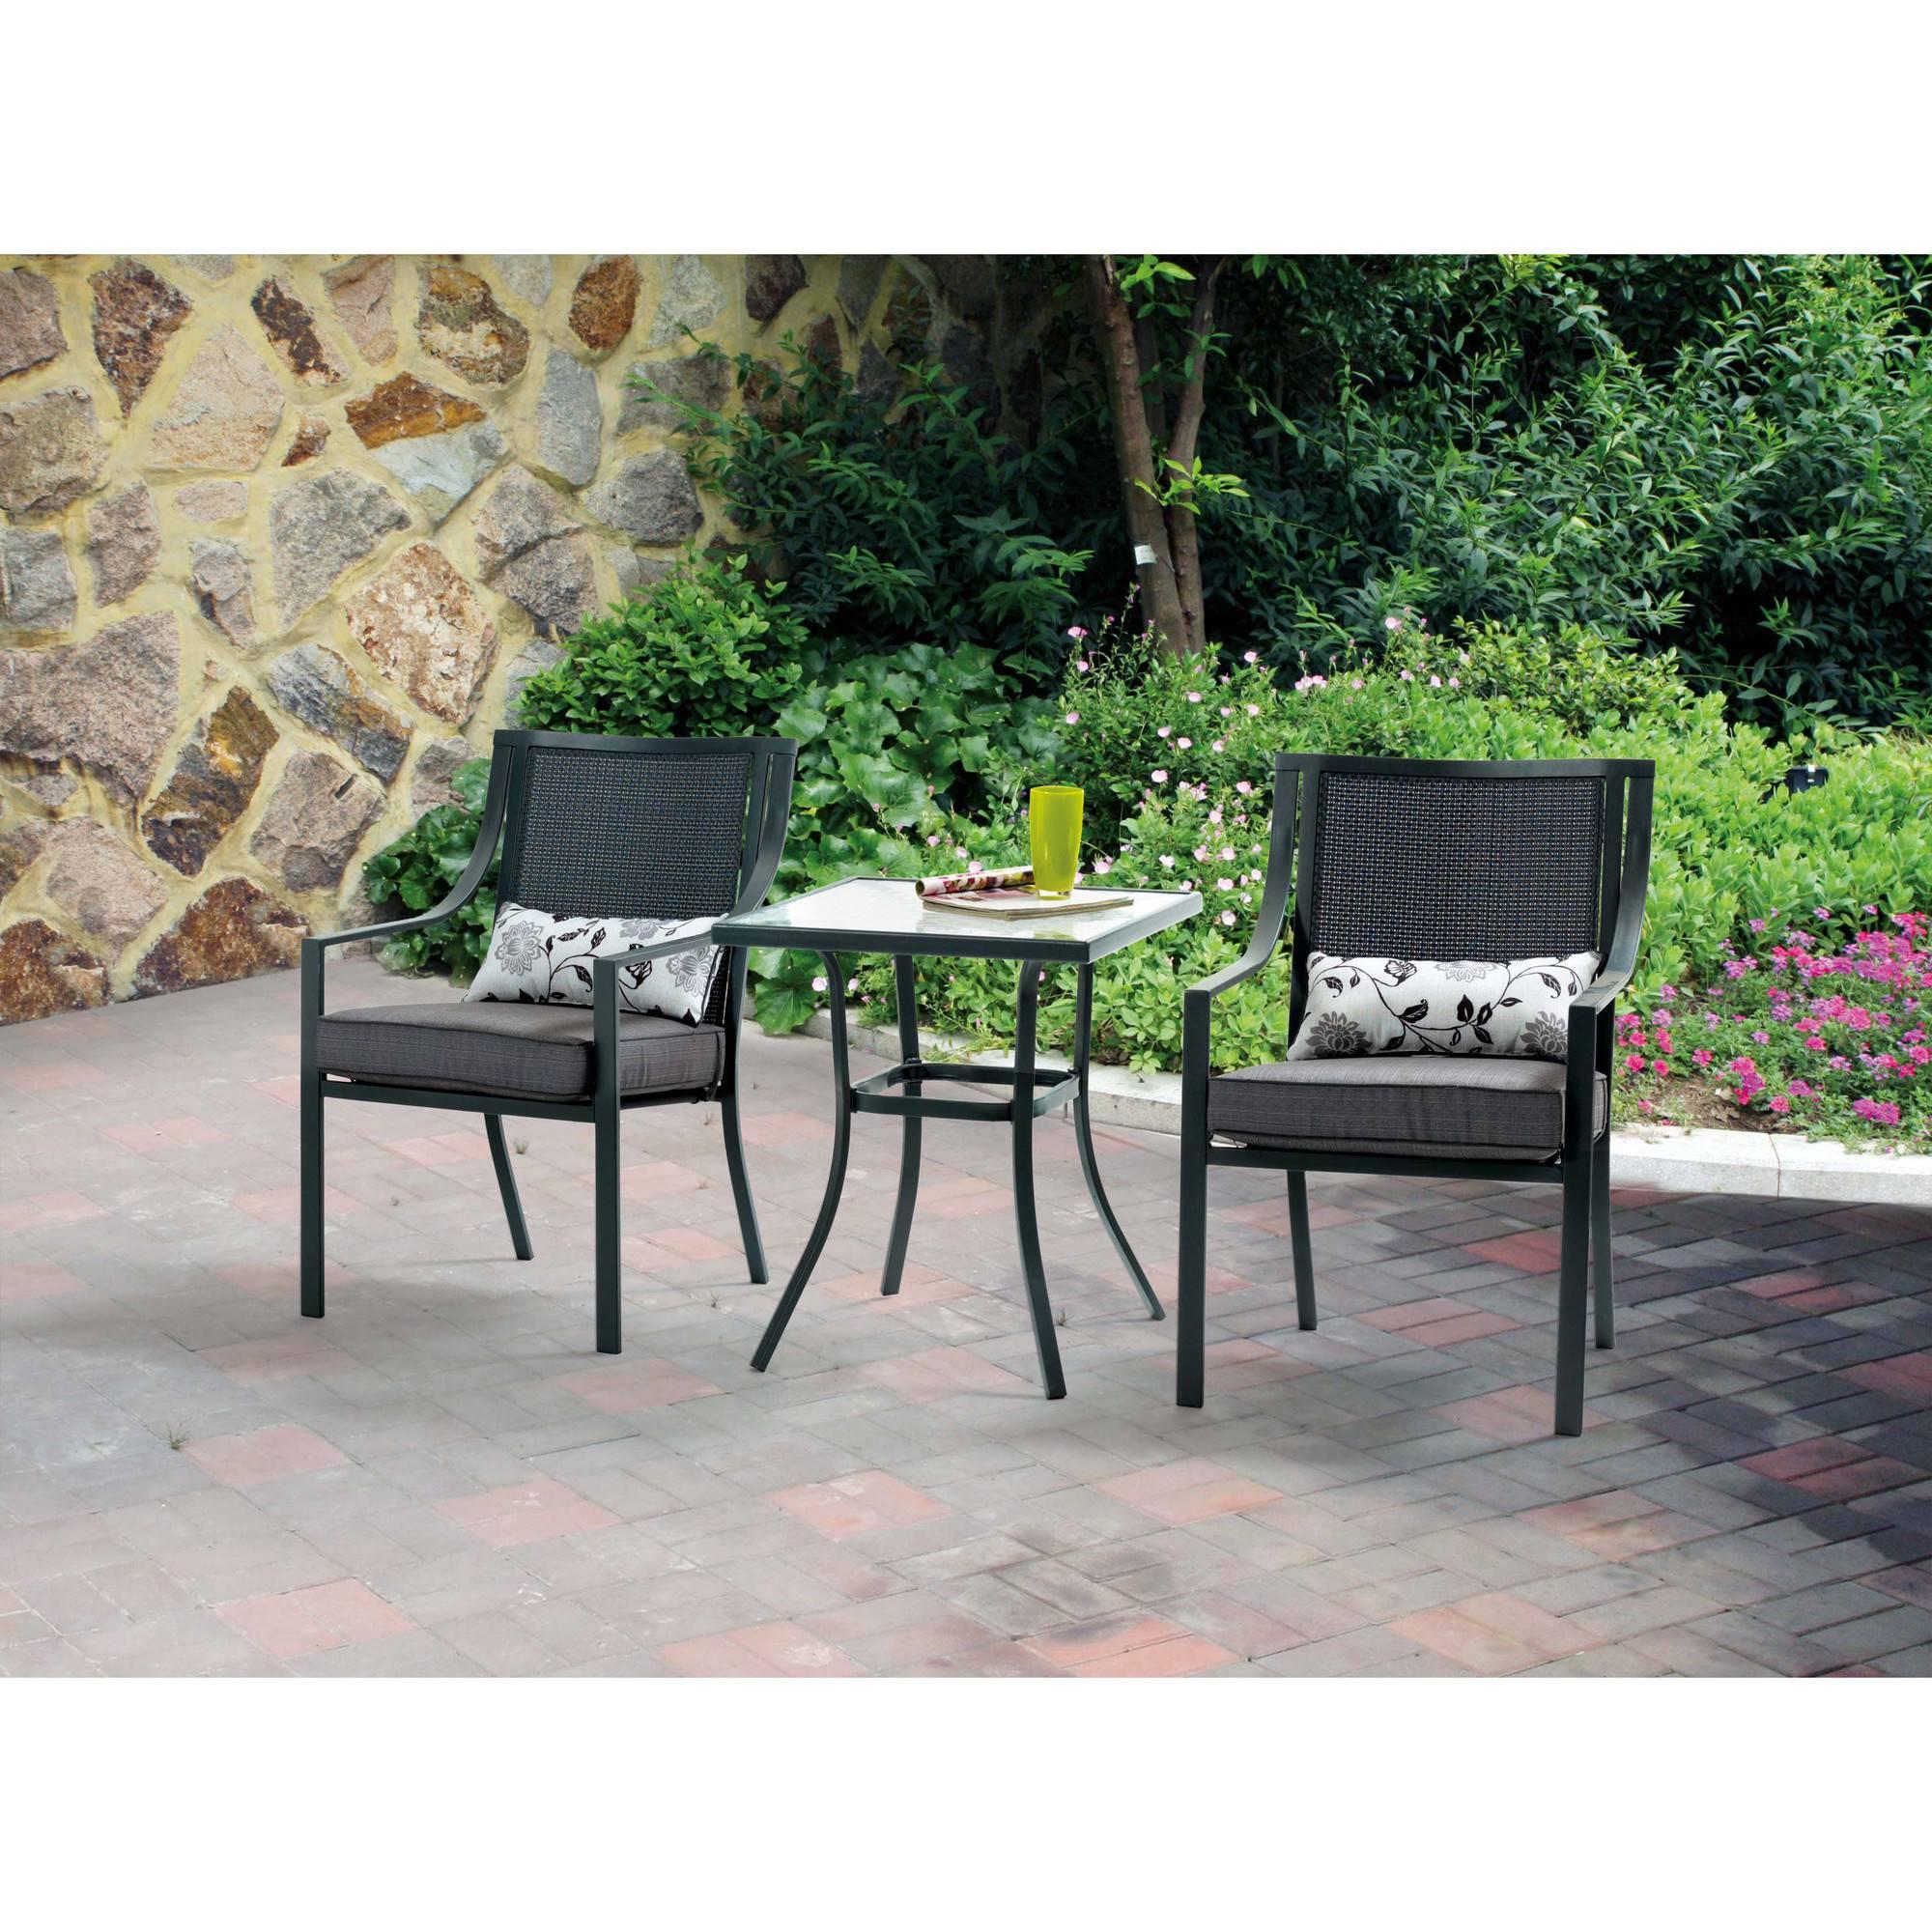 outdoor garden furniture better homes and gardens rose 3 piece outdoor bistro set - PAMZDOY